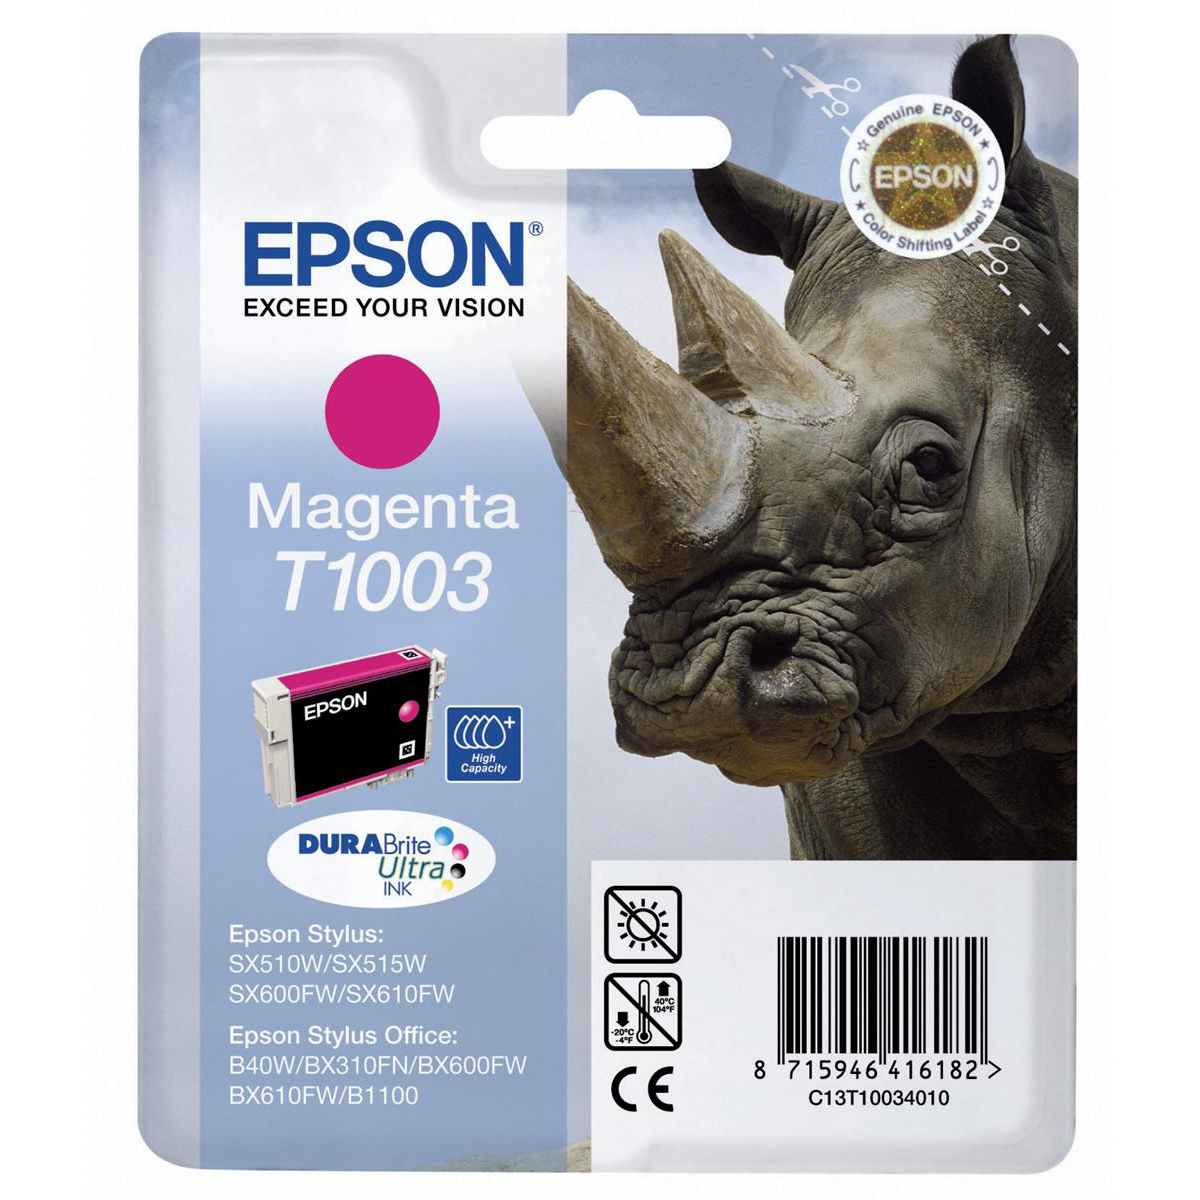 Epson T1003 Inkjet Cartridge DURABrite Ultra Rhino Magenta Ref C13T10034010